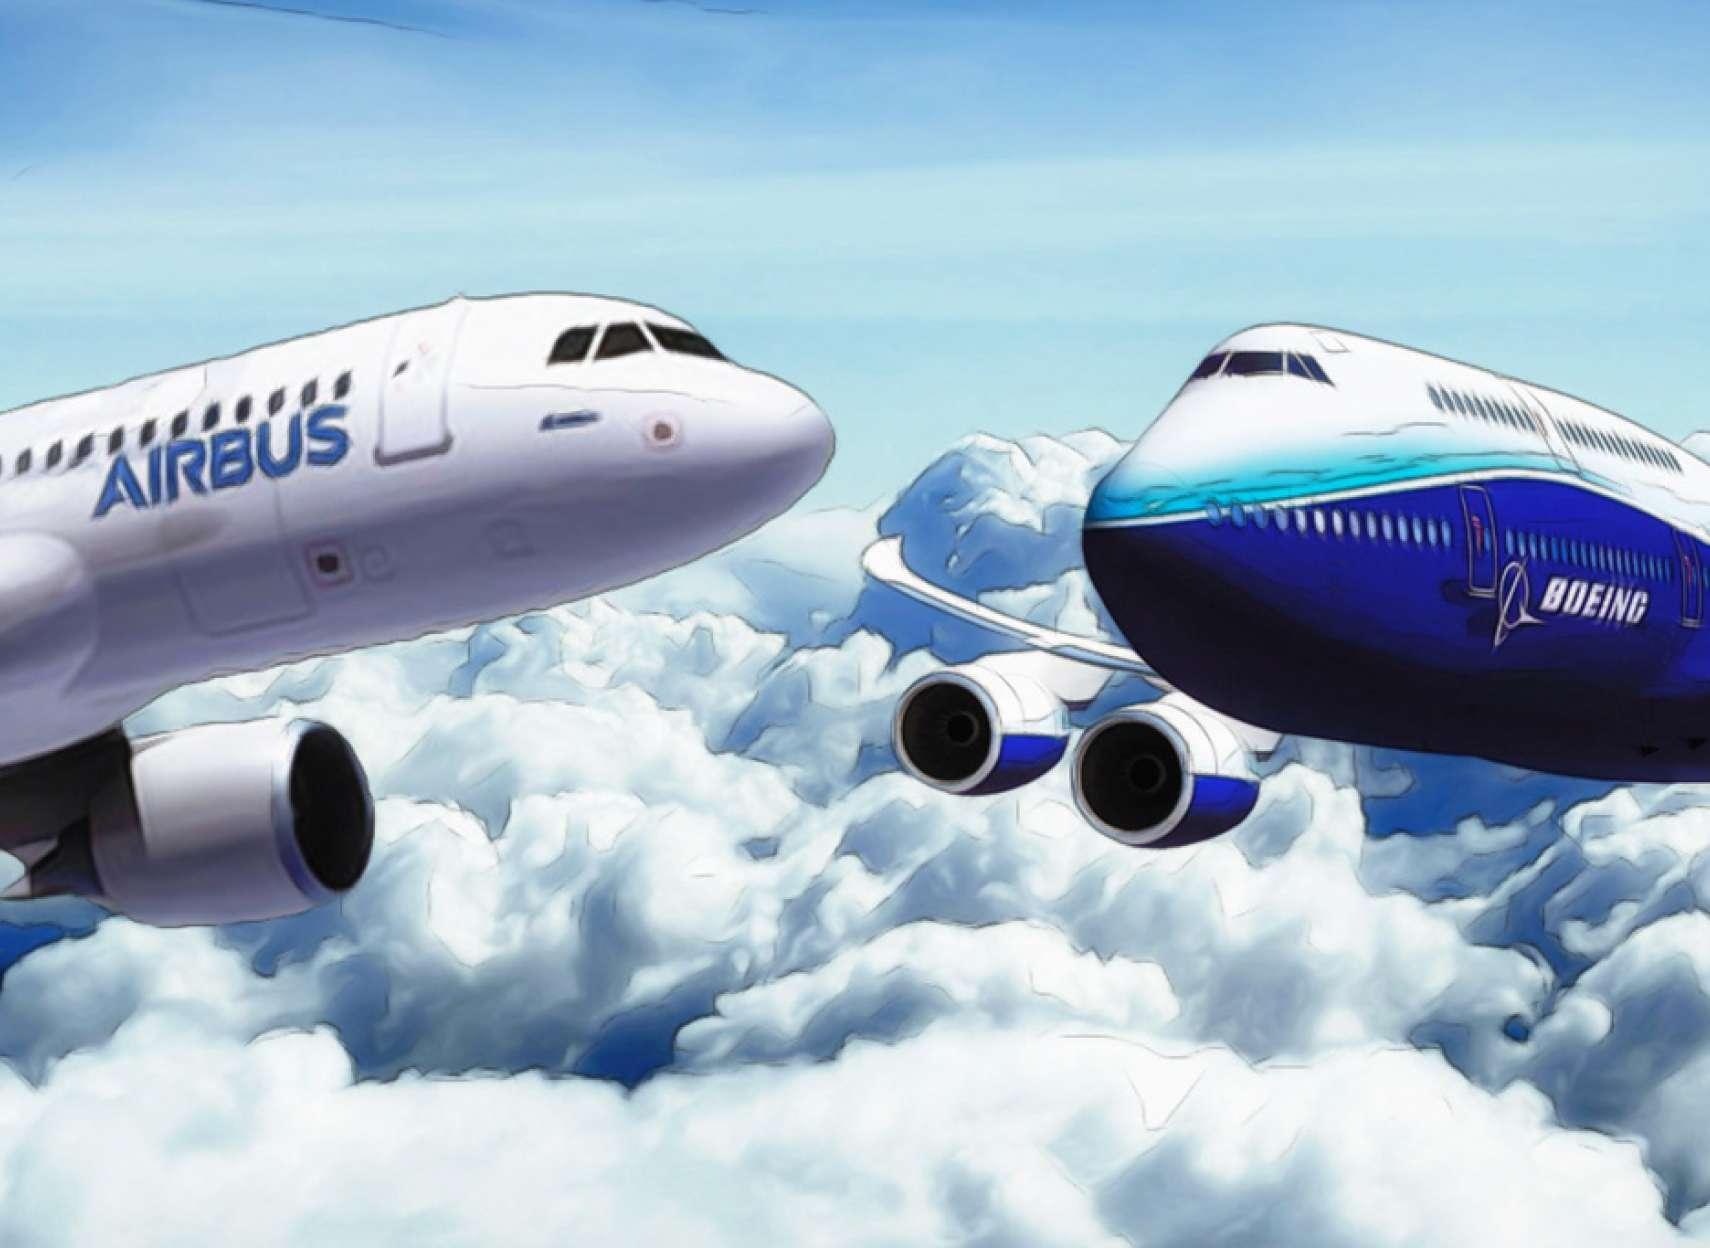 news-airbus-boeing